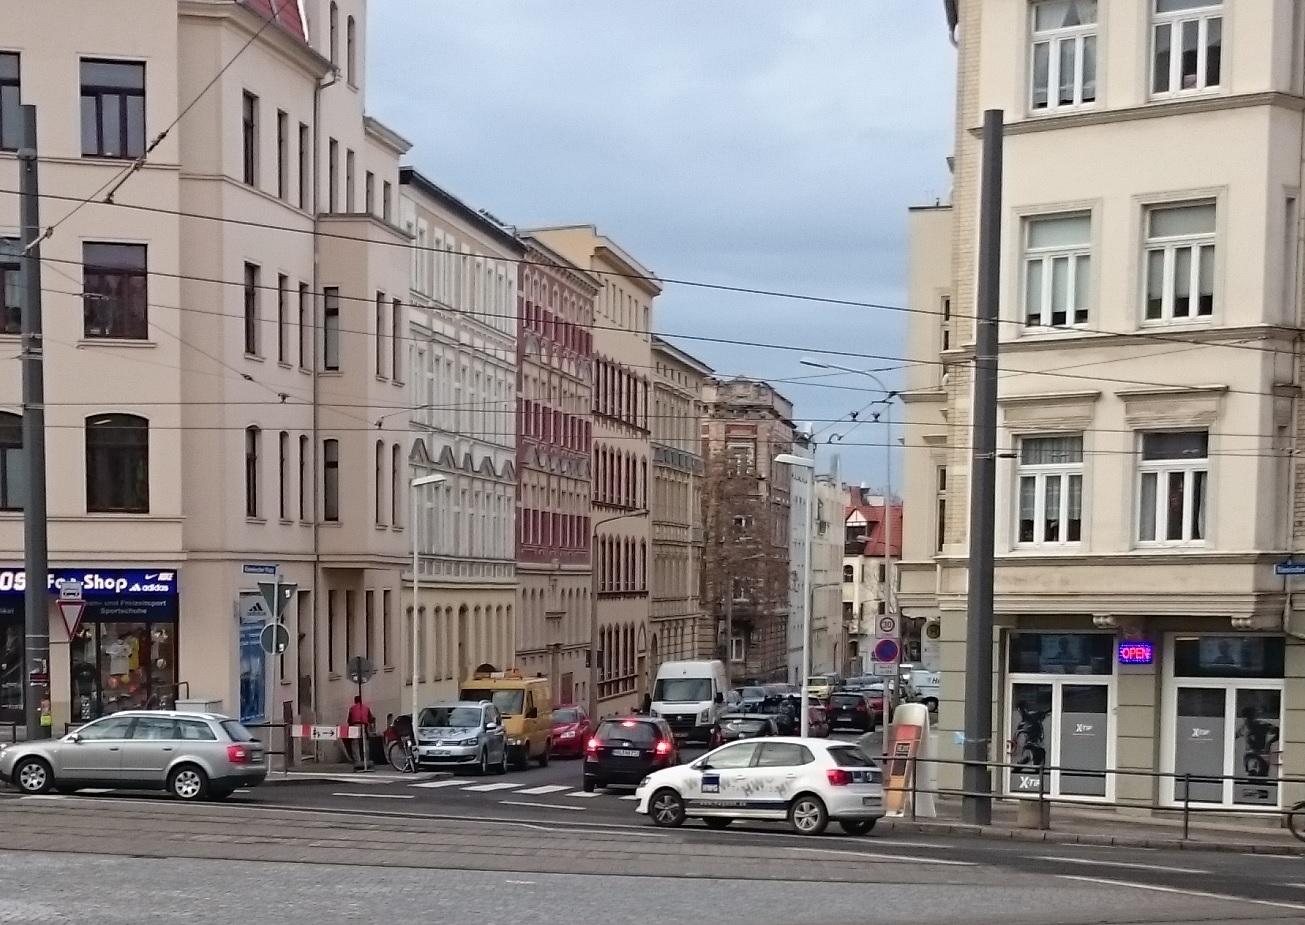 bertramstraße